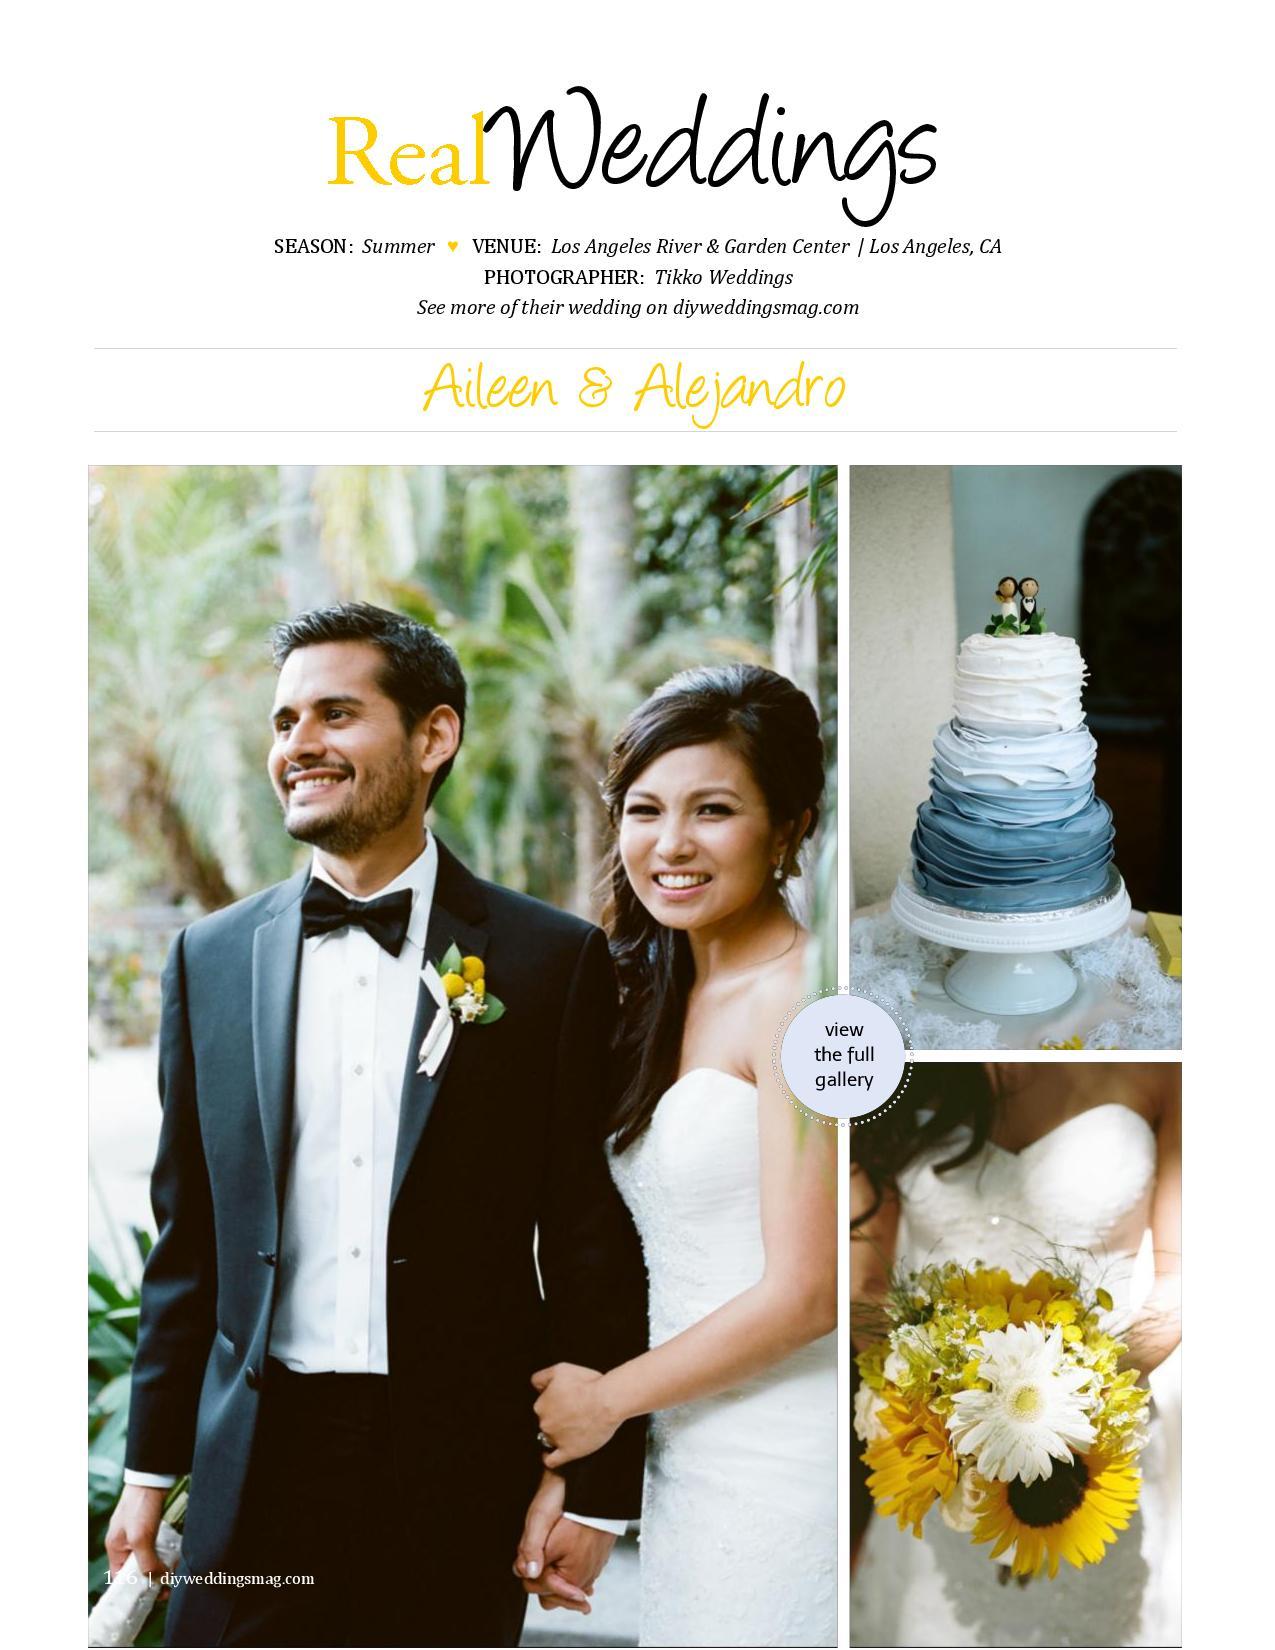 Aileen & Alejandro-DIY Weddings Mag-page-001.jpg